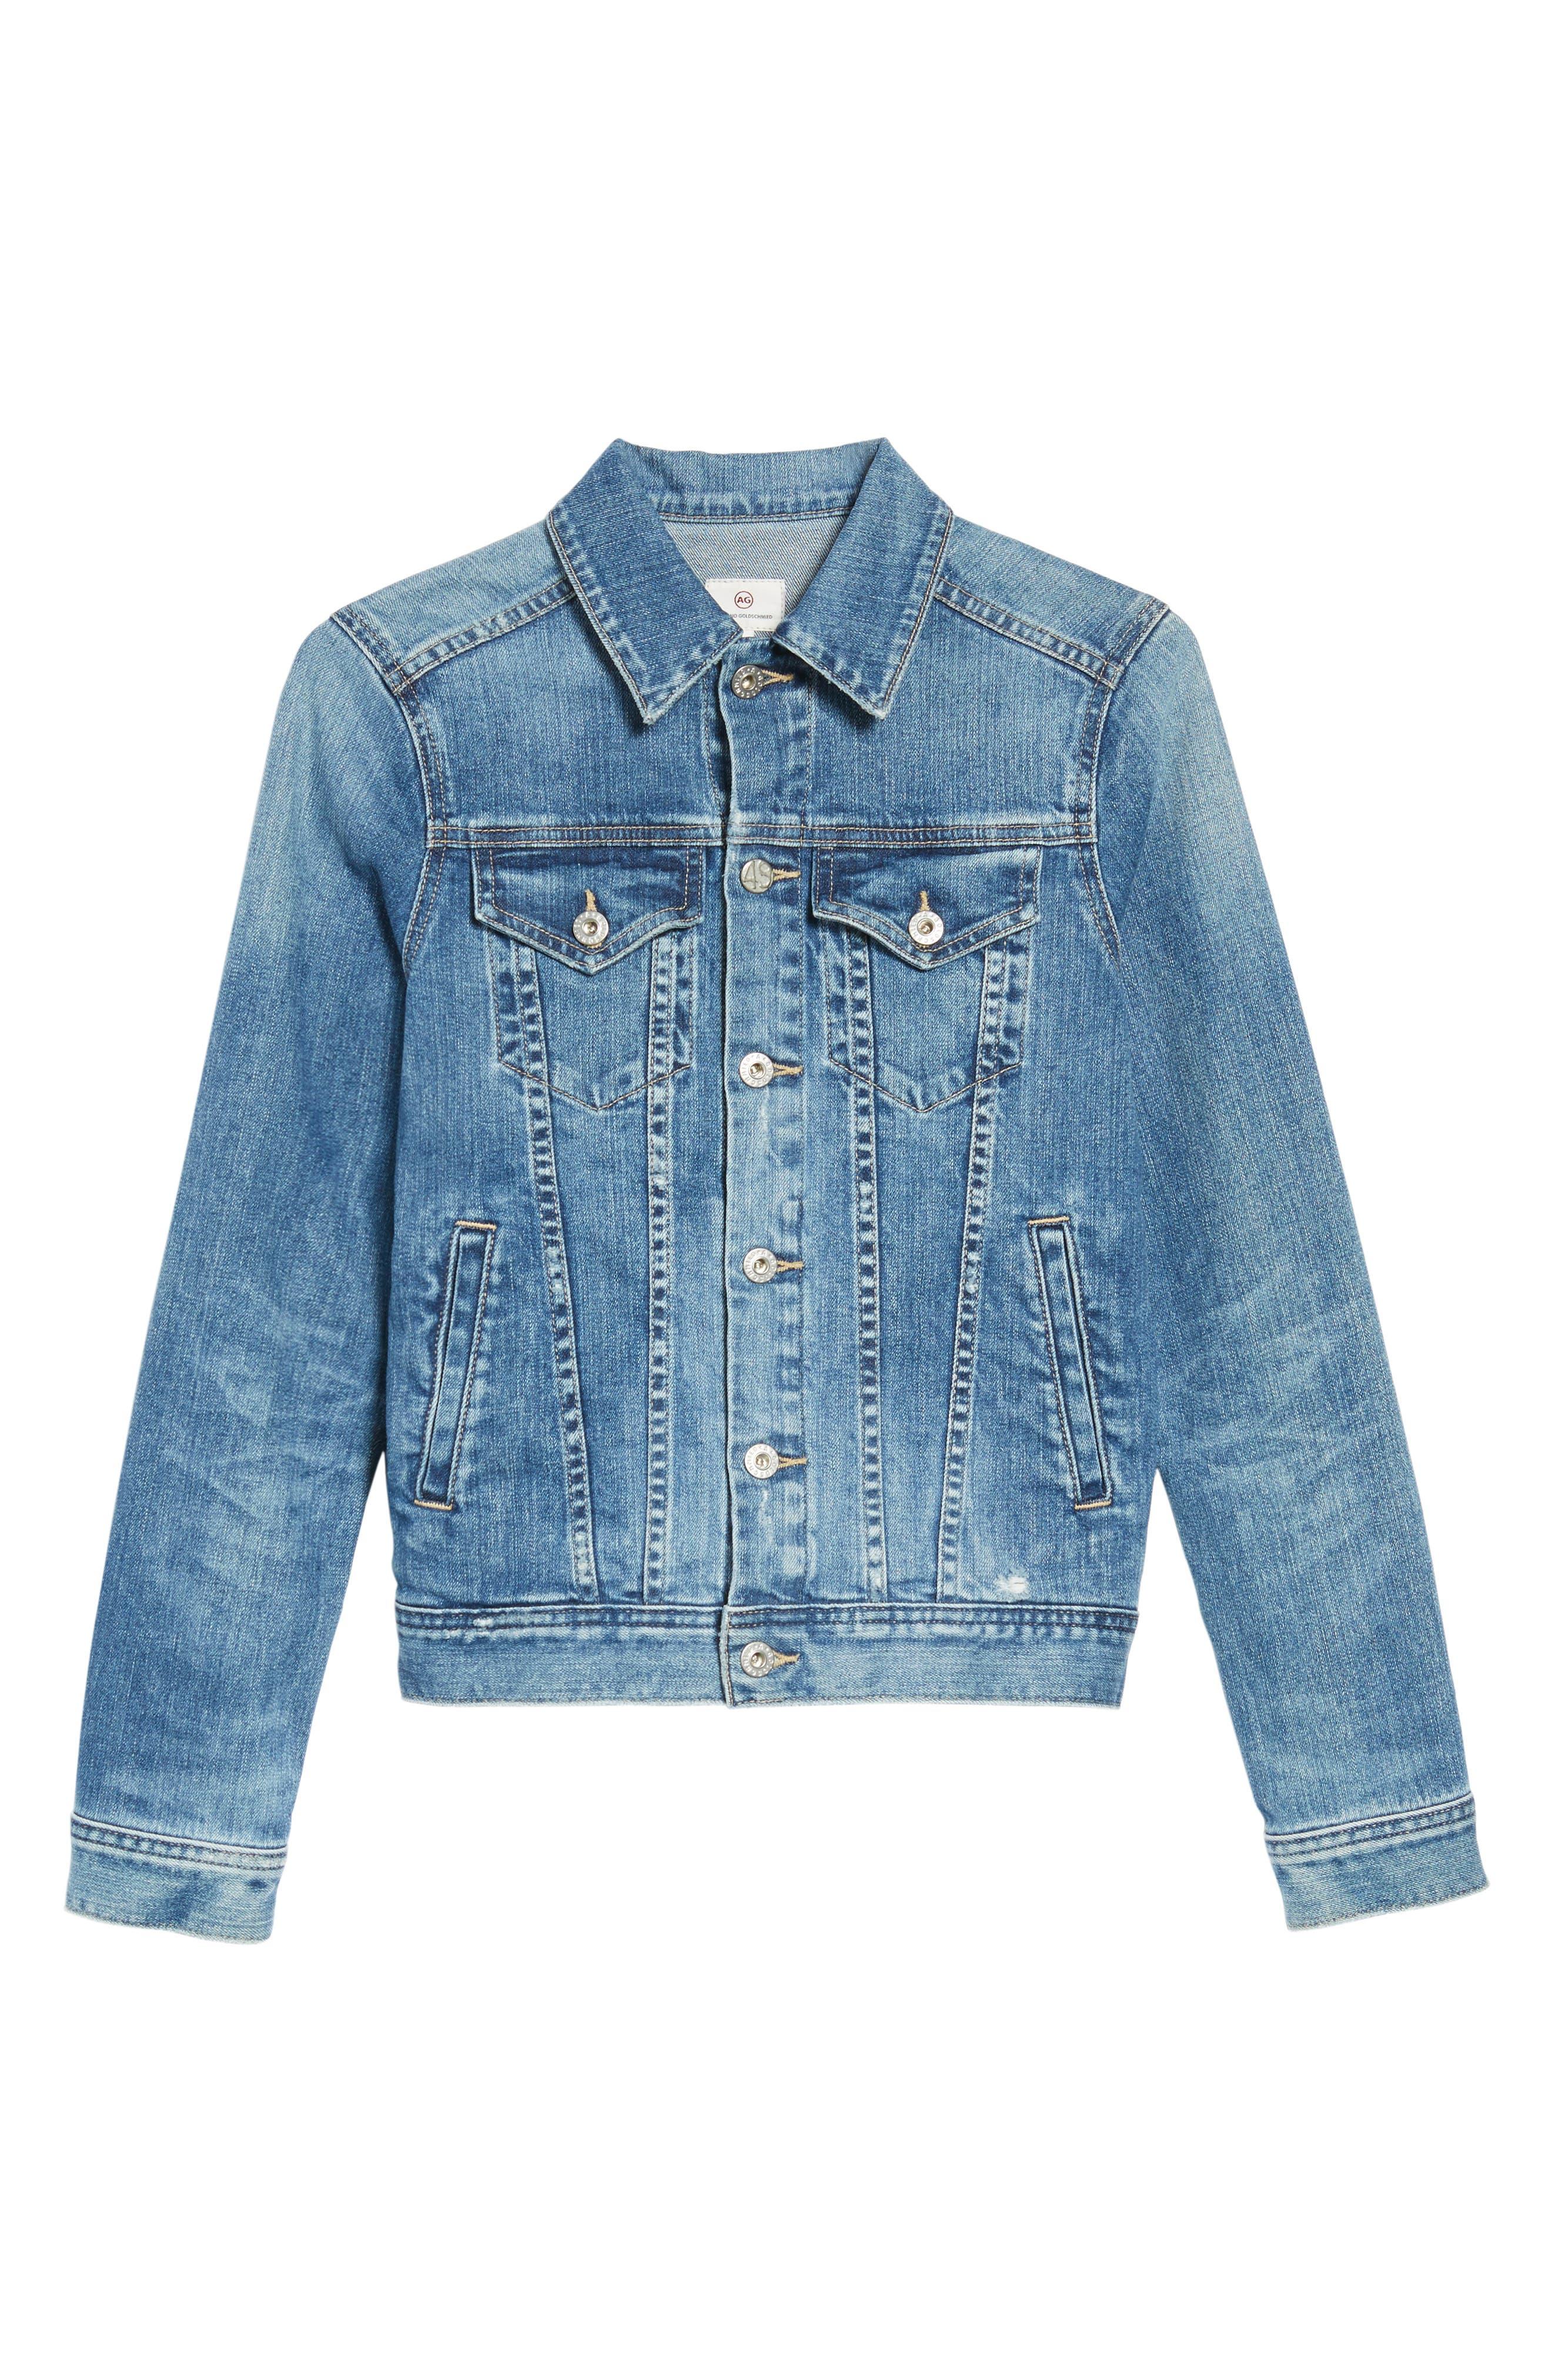 'Mya' Denim Jacket,                             Alternate thumbnail 7, color,                             10 Years Magnetic Blue